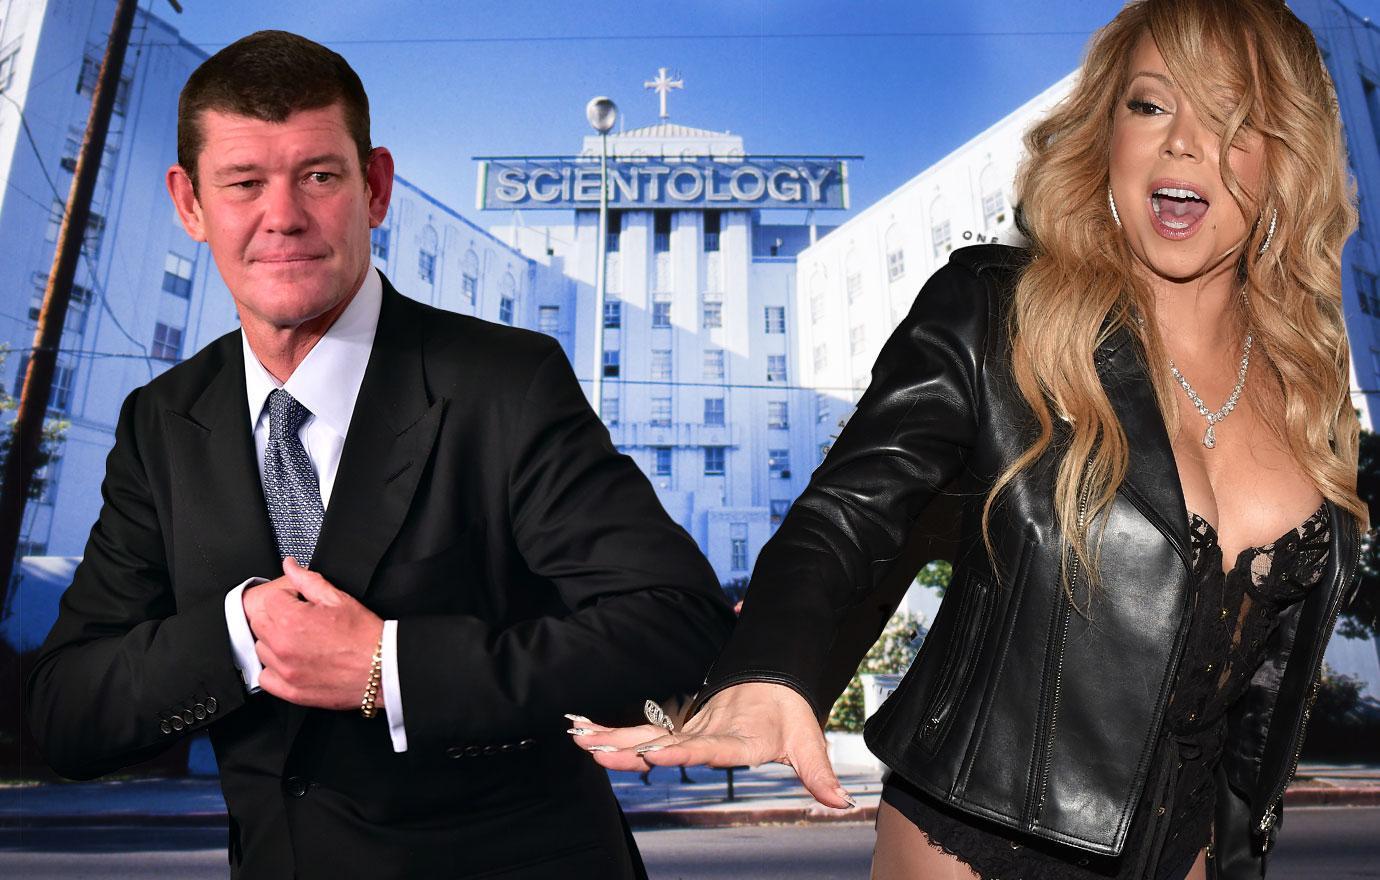 Billionaire James Packer Cuts All Scientology Ties After Failed Mariah Carey Romance